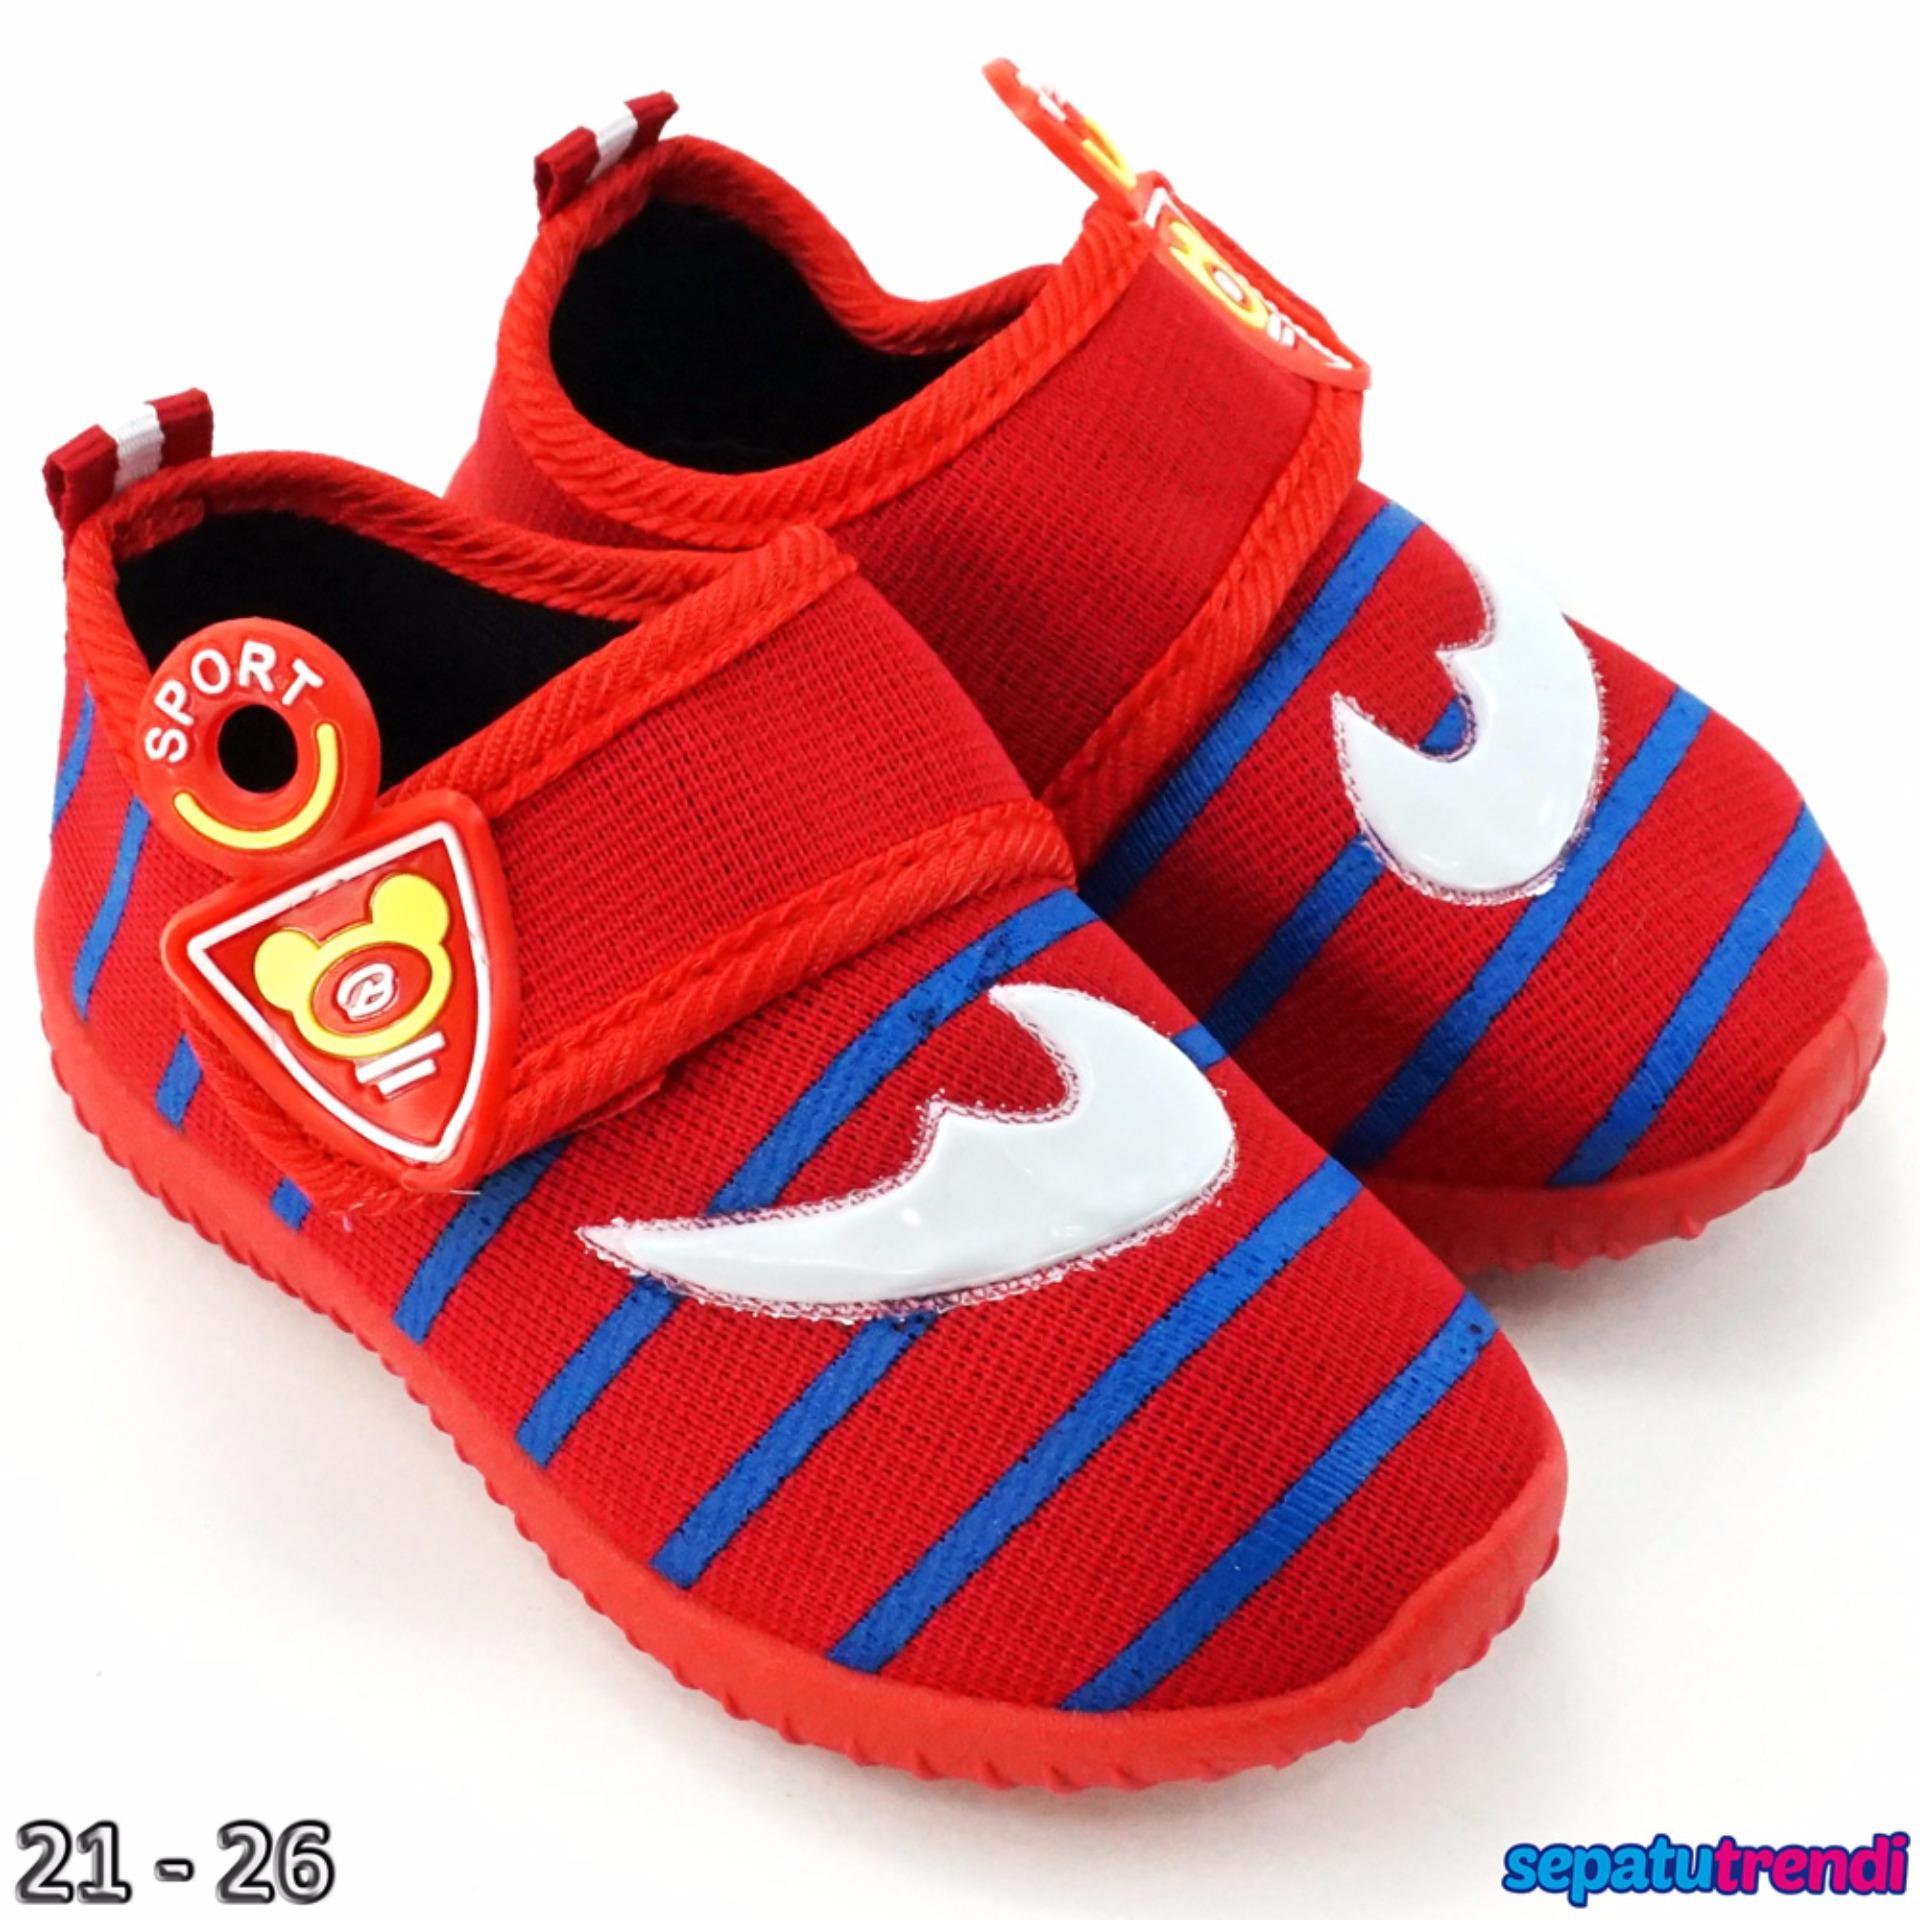 Harga Trendishoes Sepatu Anak Bayi Cowo Velcro Boomerang Rdcnik Merah Merk Trendishoes